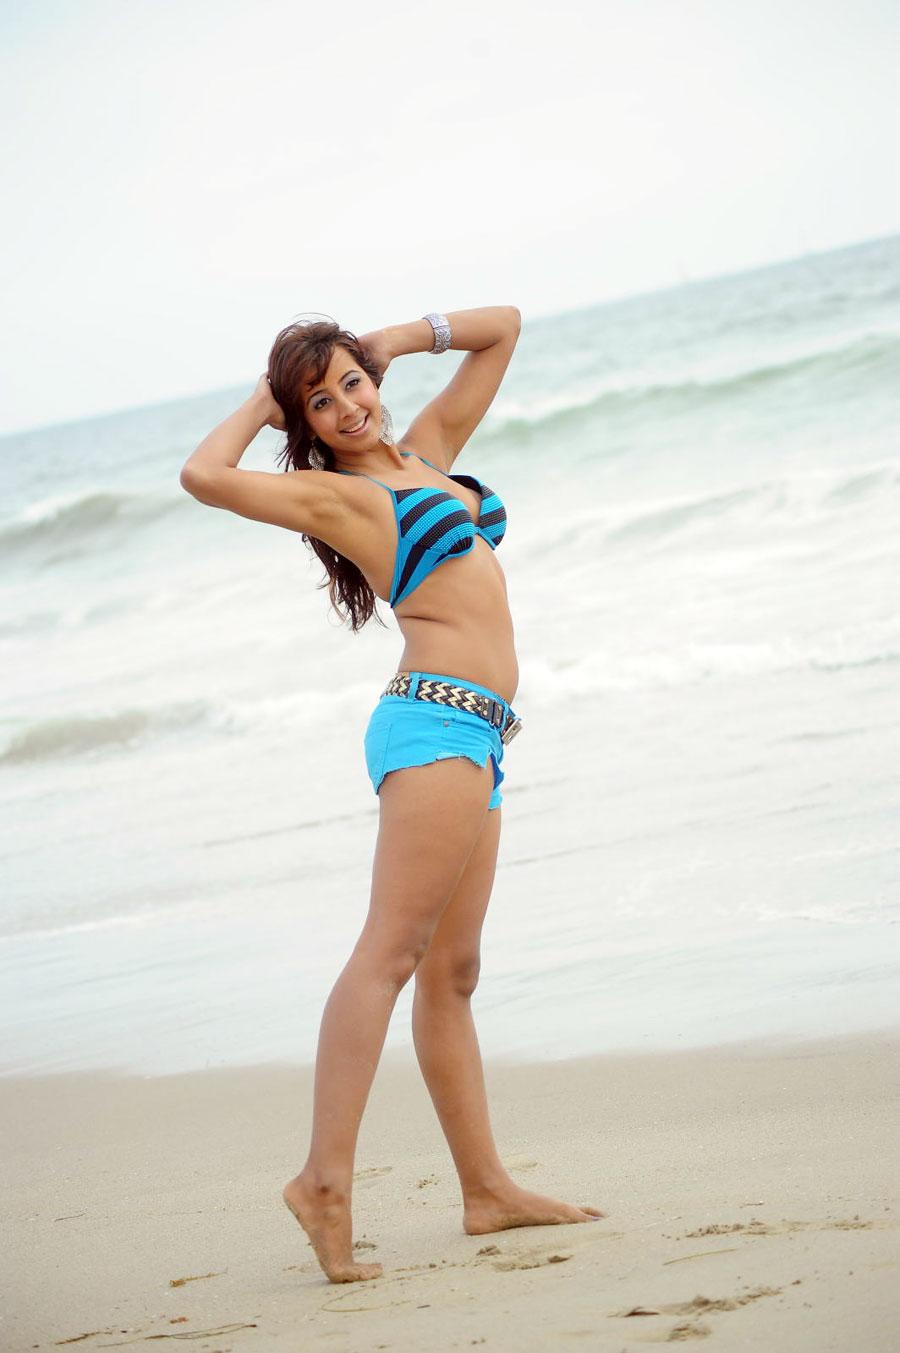 sanjjana bikini beach hot images